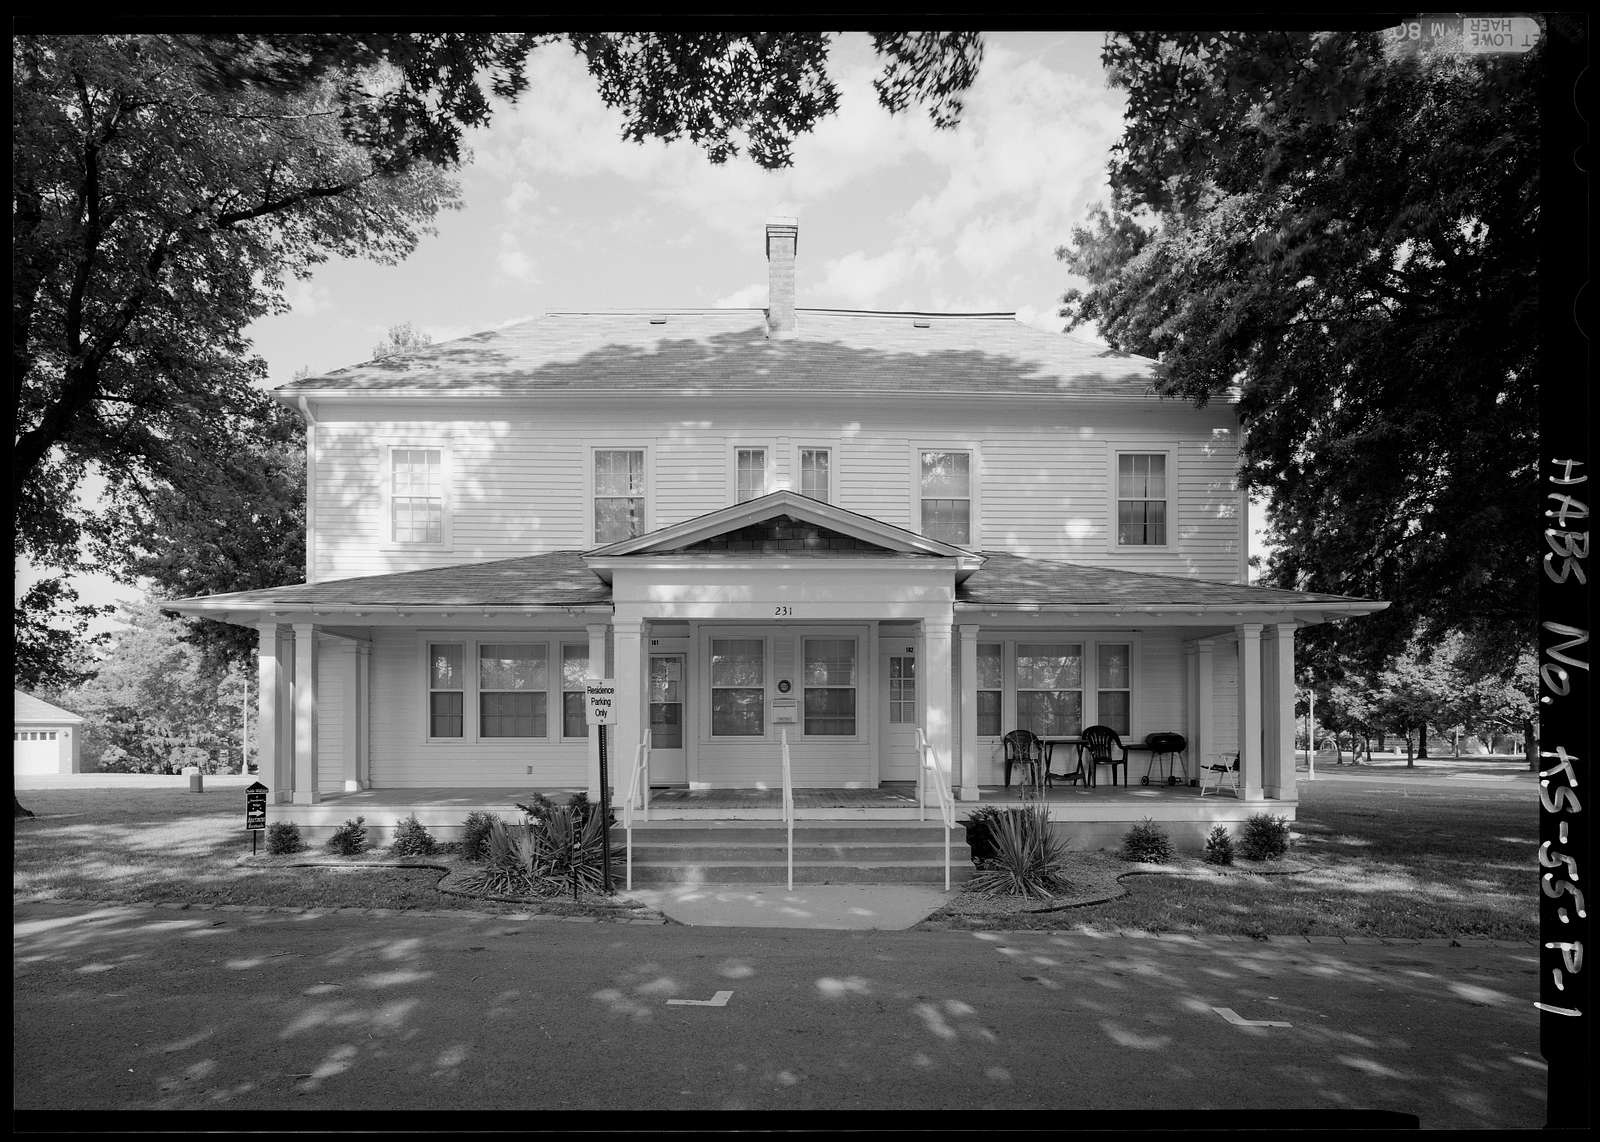 National Home for Disabled Volunteer Soldiers, Western Branch, Duplex Quarters No. 201-202, Franklin Avenue, Leavenworth, Leavenworth County, KS